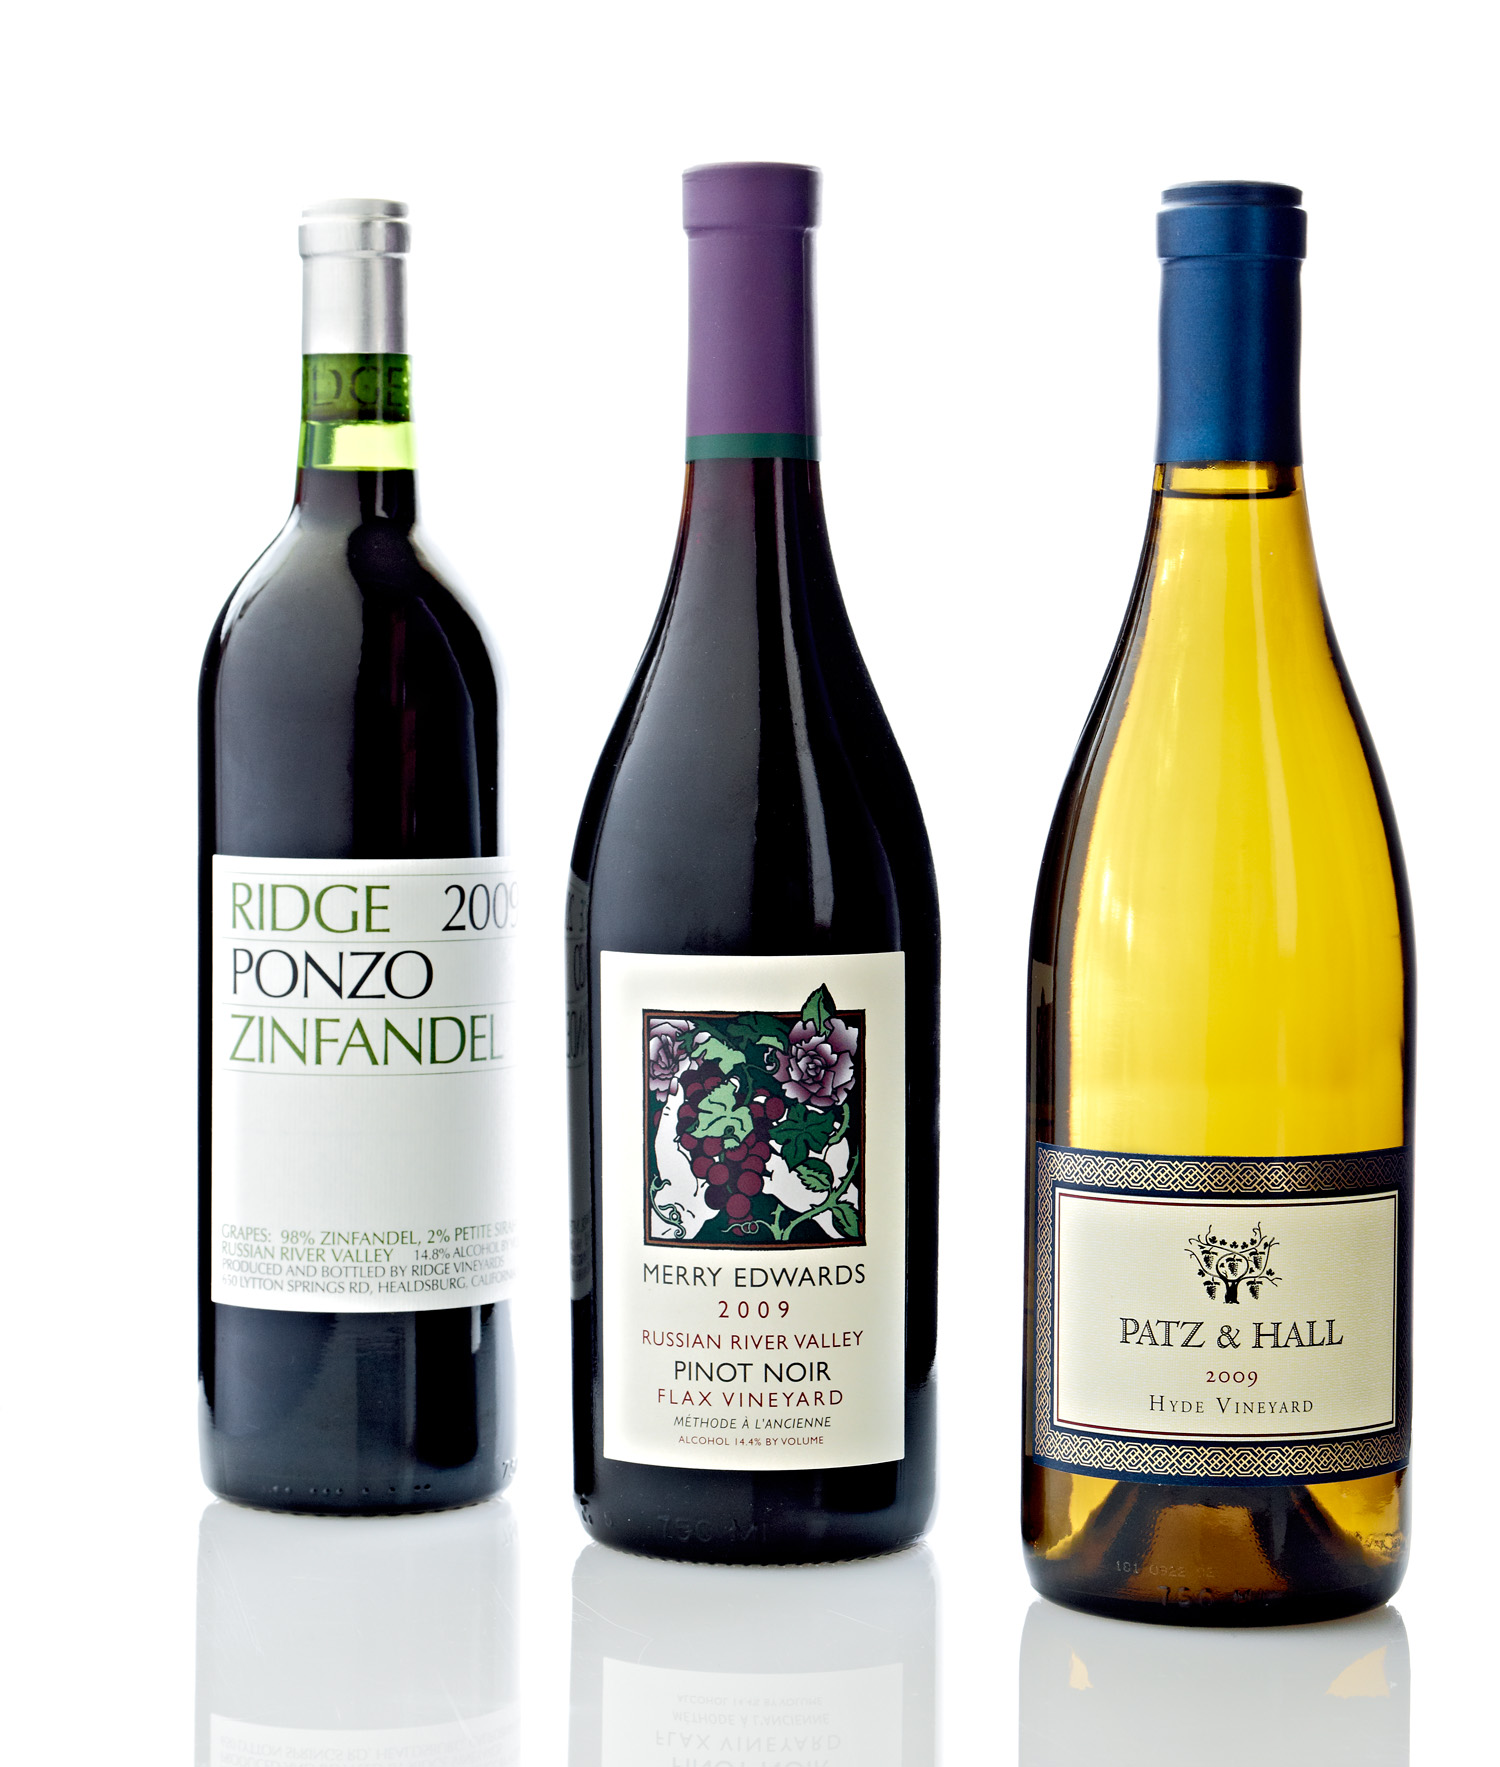 Guides - Santa Rosa CA - Wineries - Dave s Travel Corner